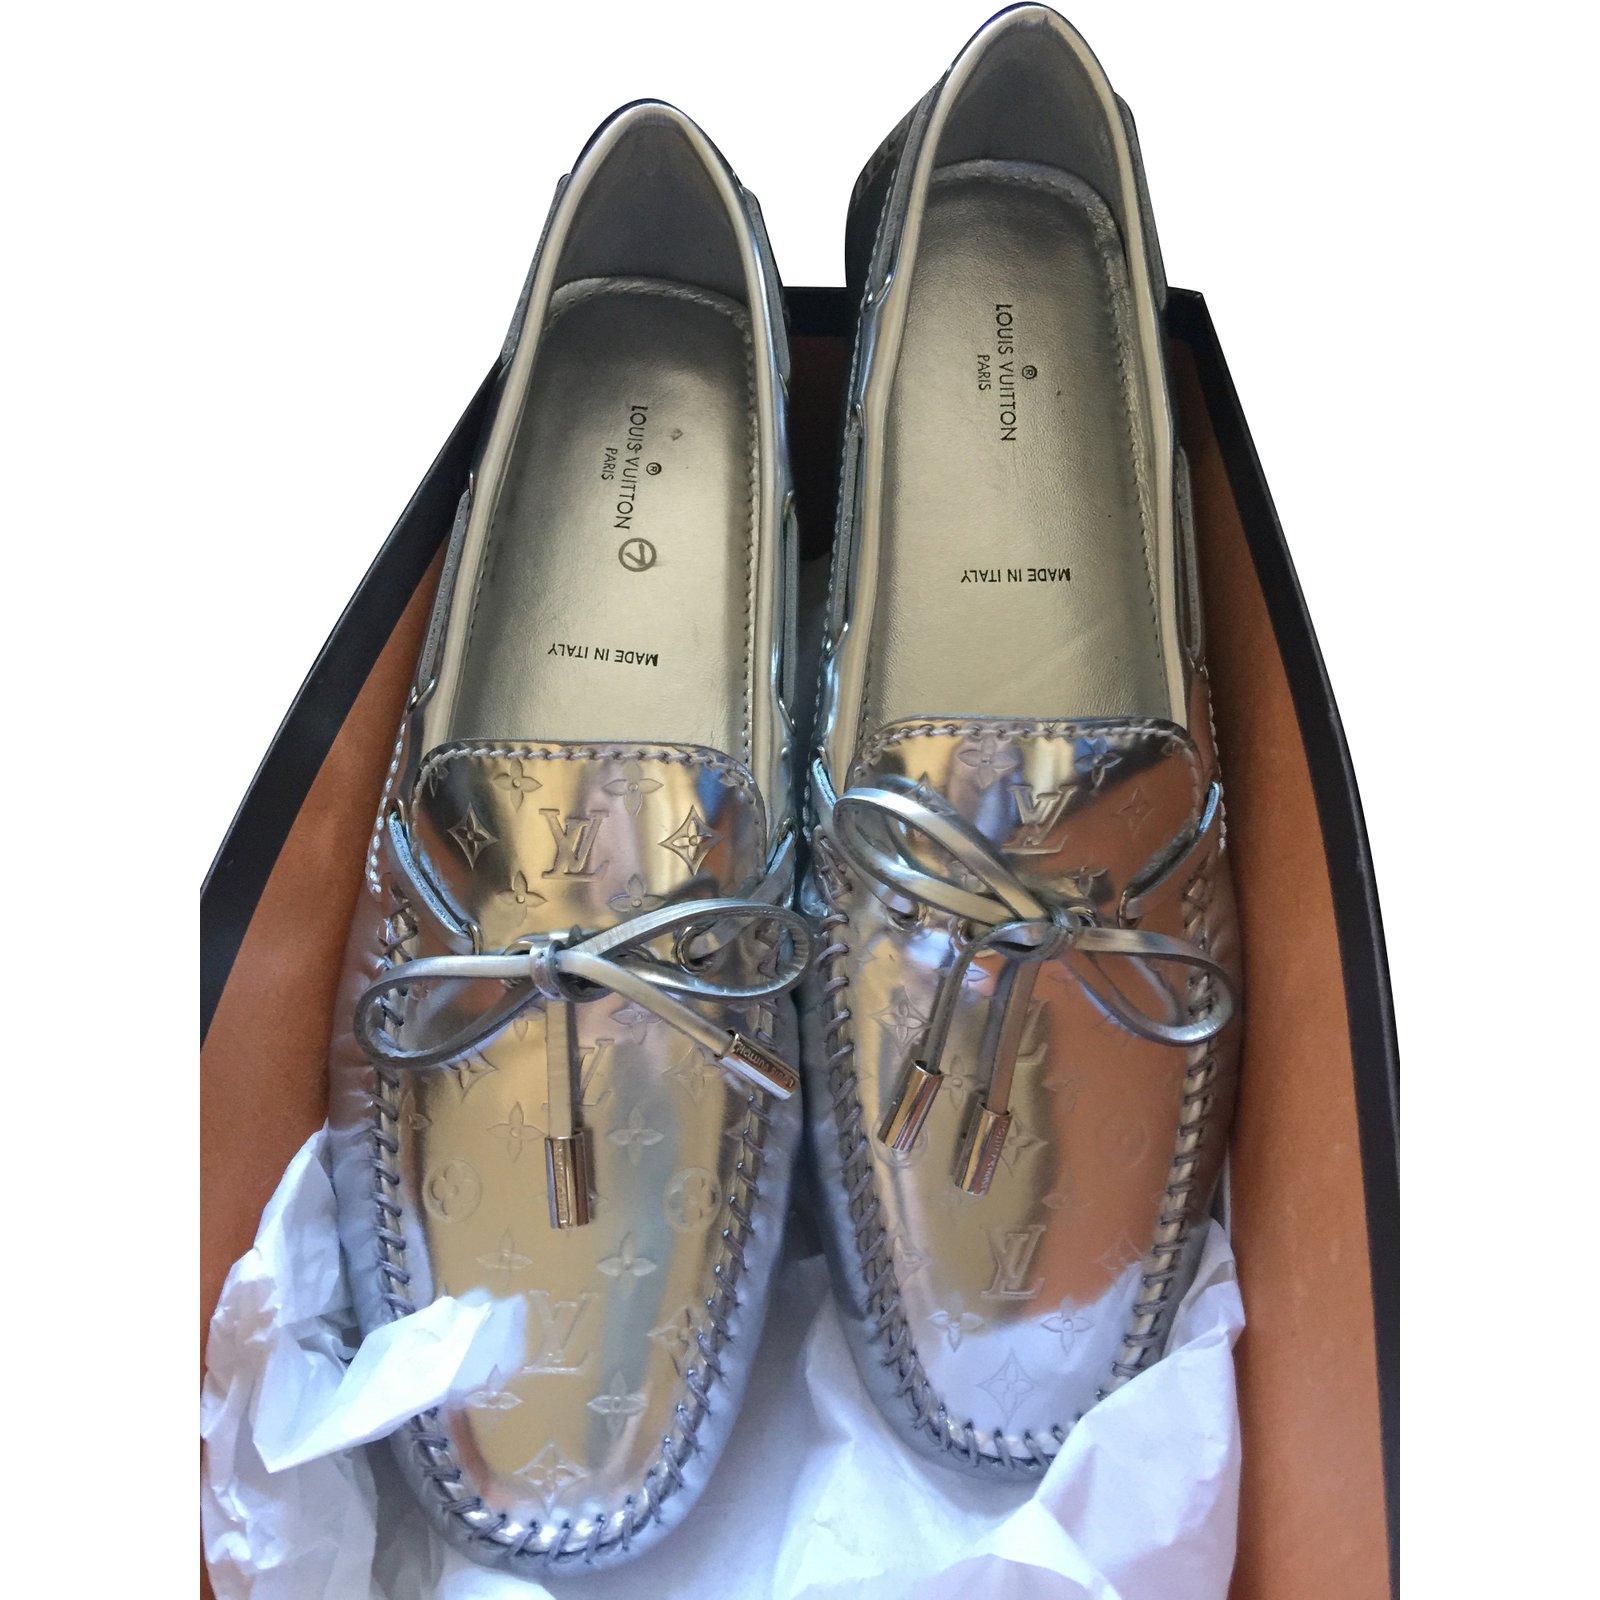 b492cd5b6c5d Louis Vuitton Gloria Flat Loafer Flats Patent leather Silvery ref.87546 -  Joli Closet